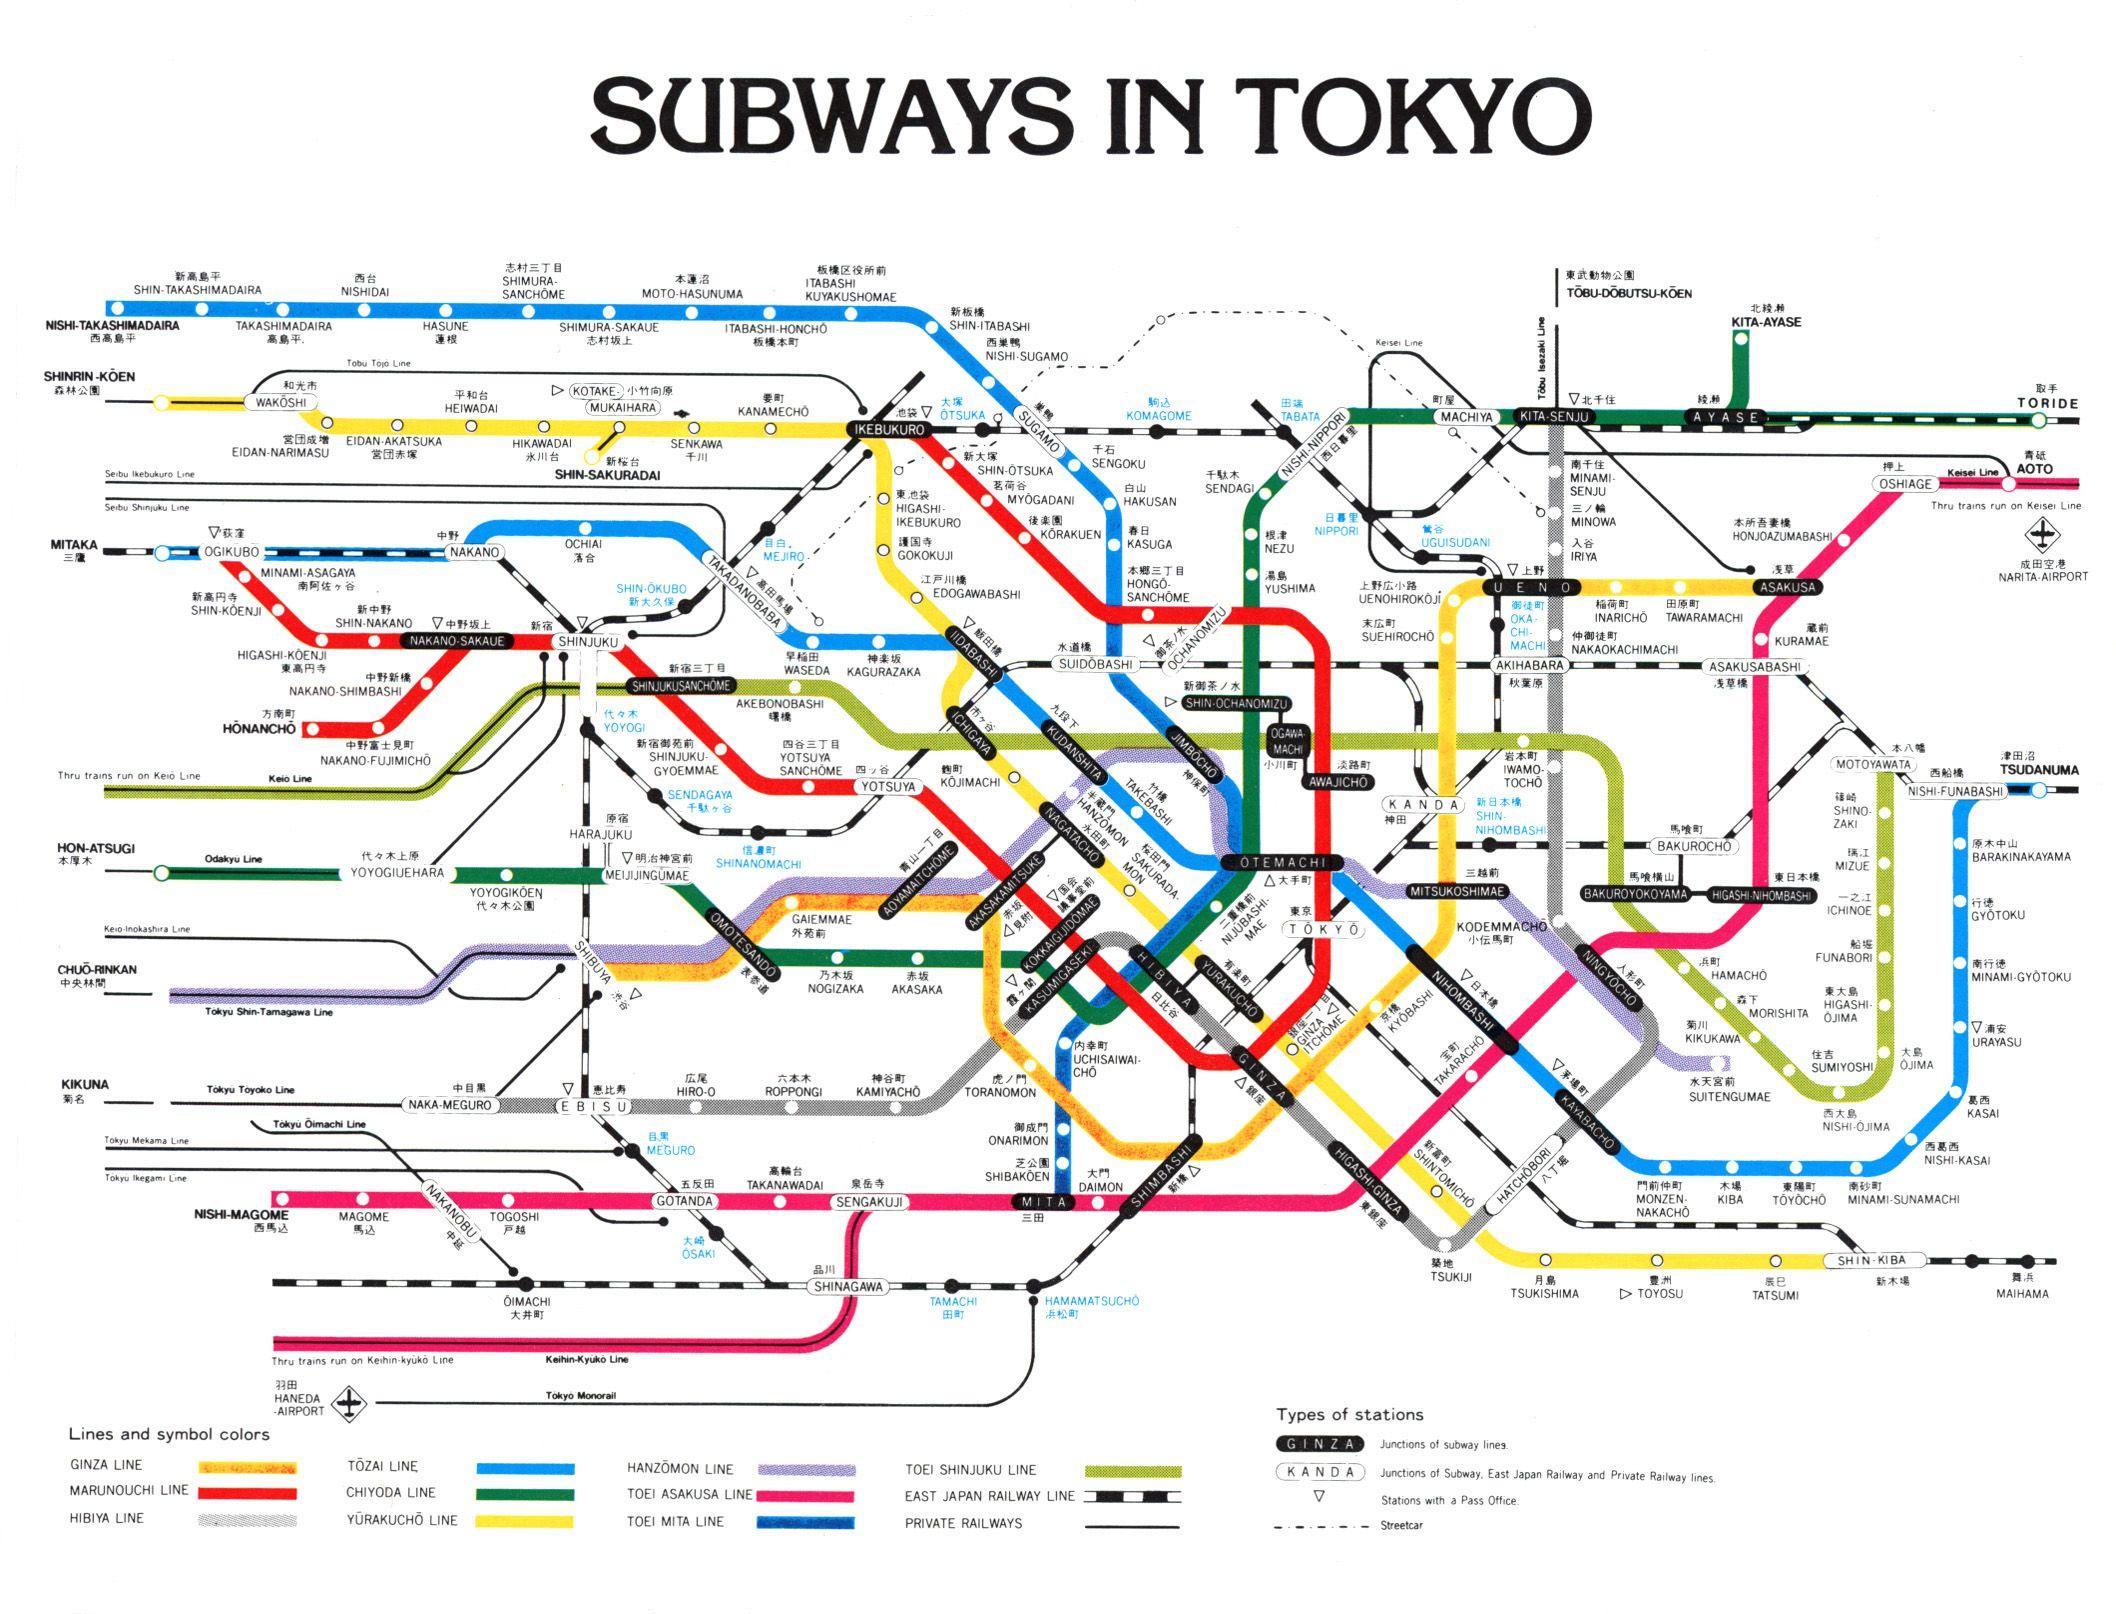 Tokyo Subway Maps.Tokyo Subway Map Tokyo Mappery Tokyo Subway Subway Map Train Map